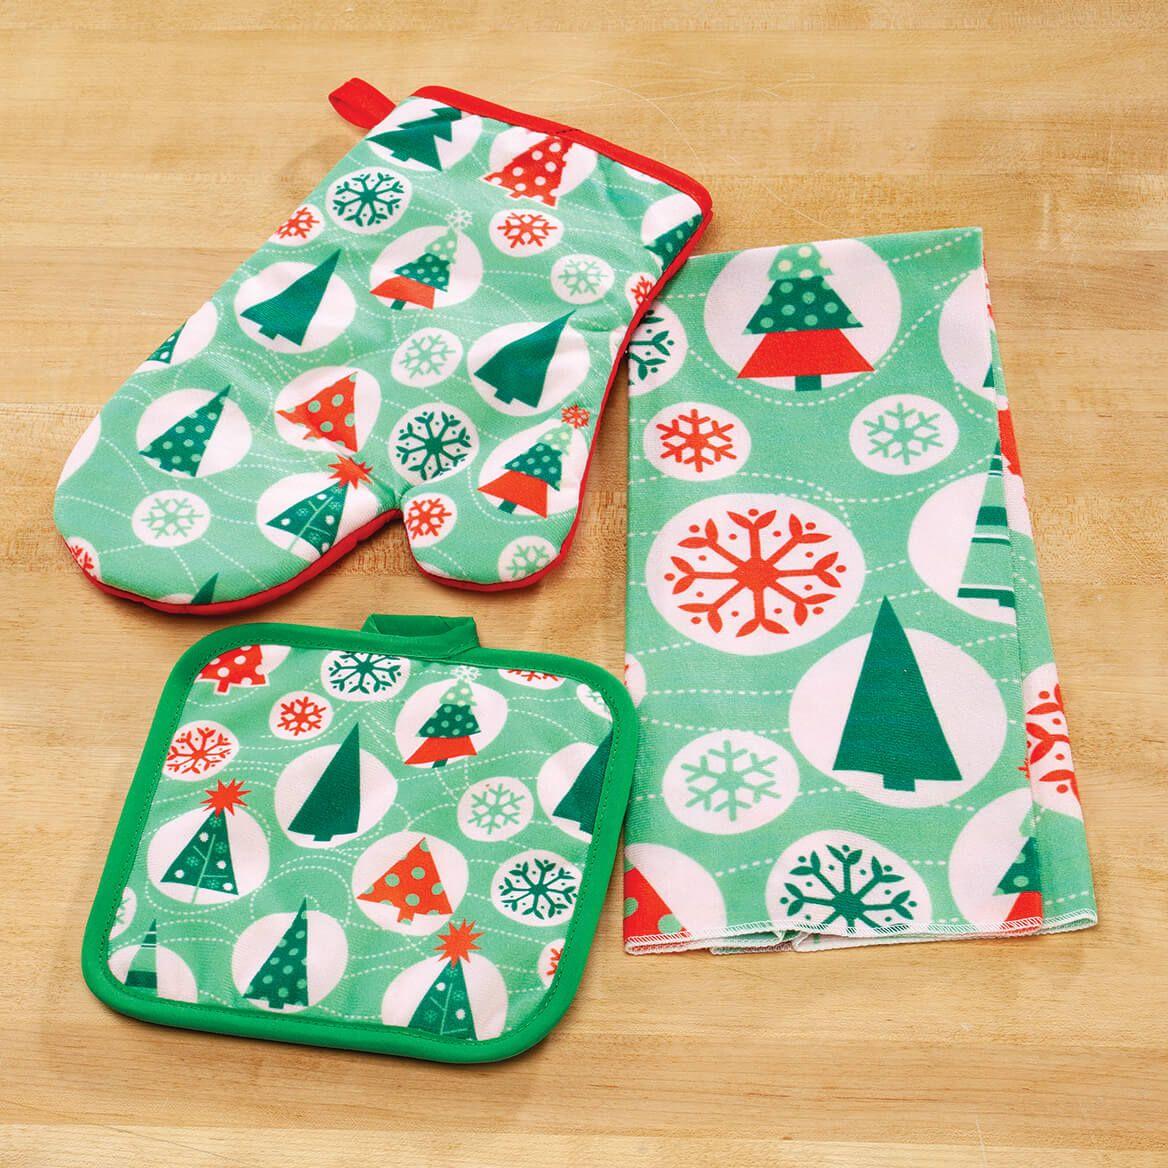 Retro Christmas Kitchen Towel, Oven Mitt and Potholder Set-372217